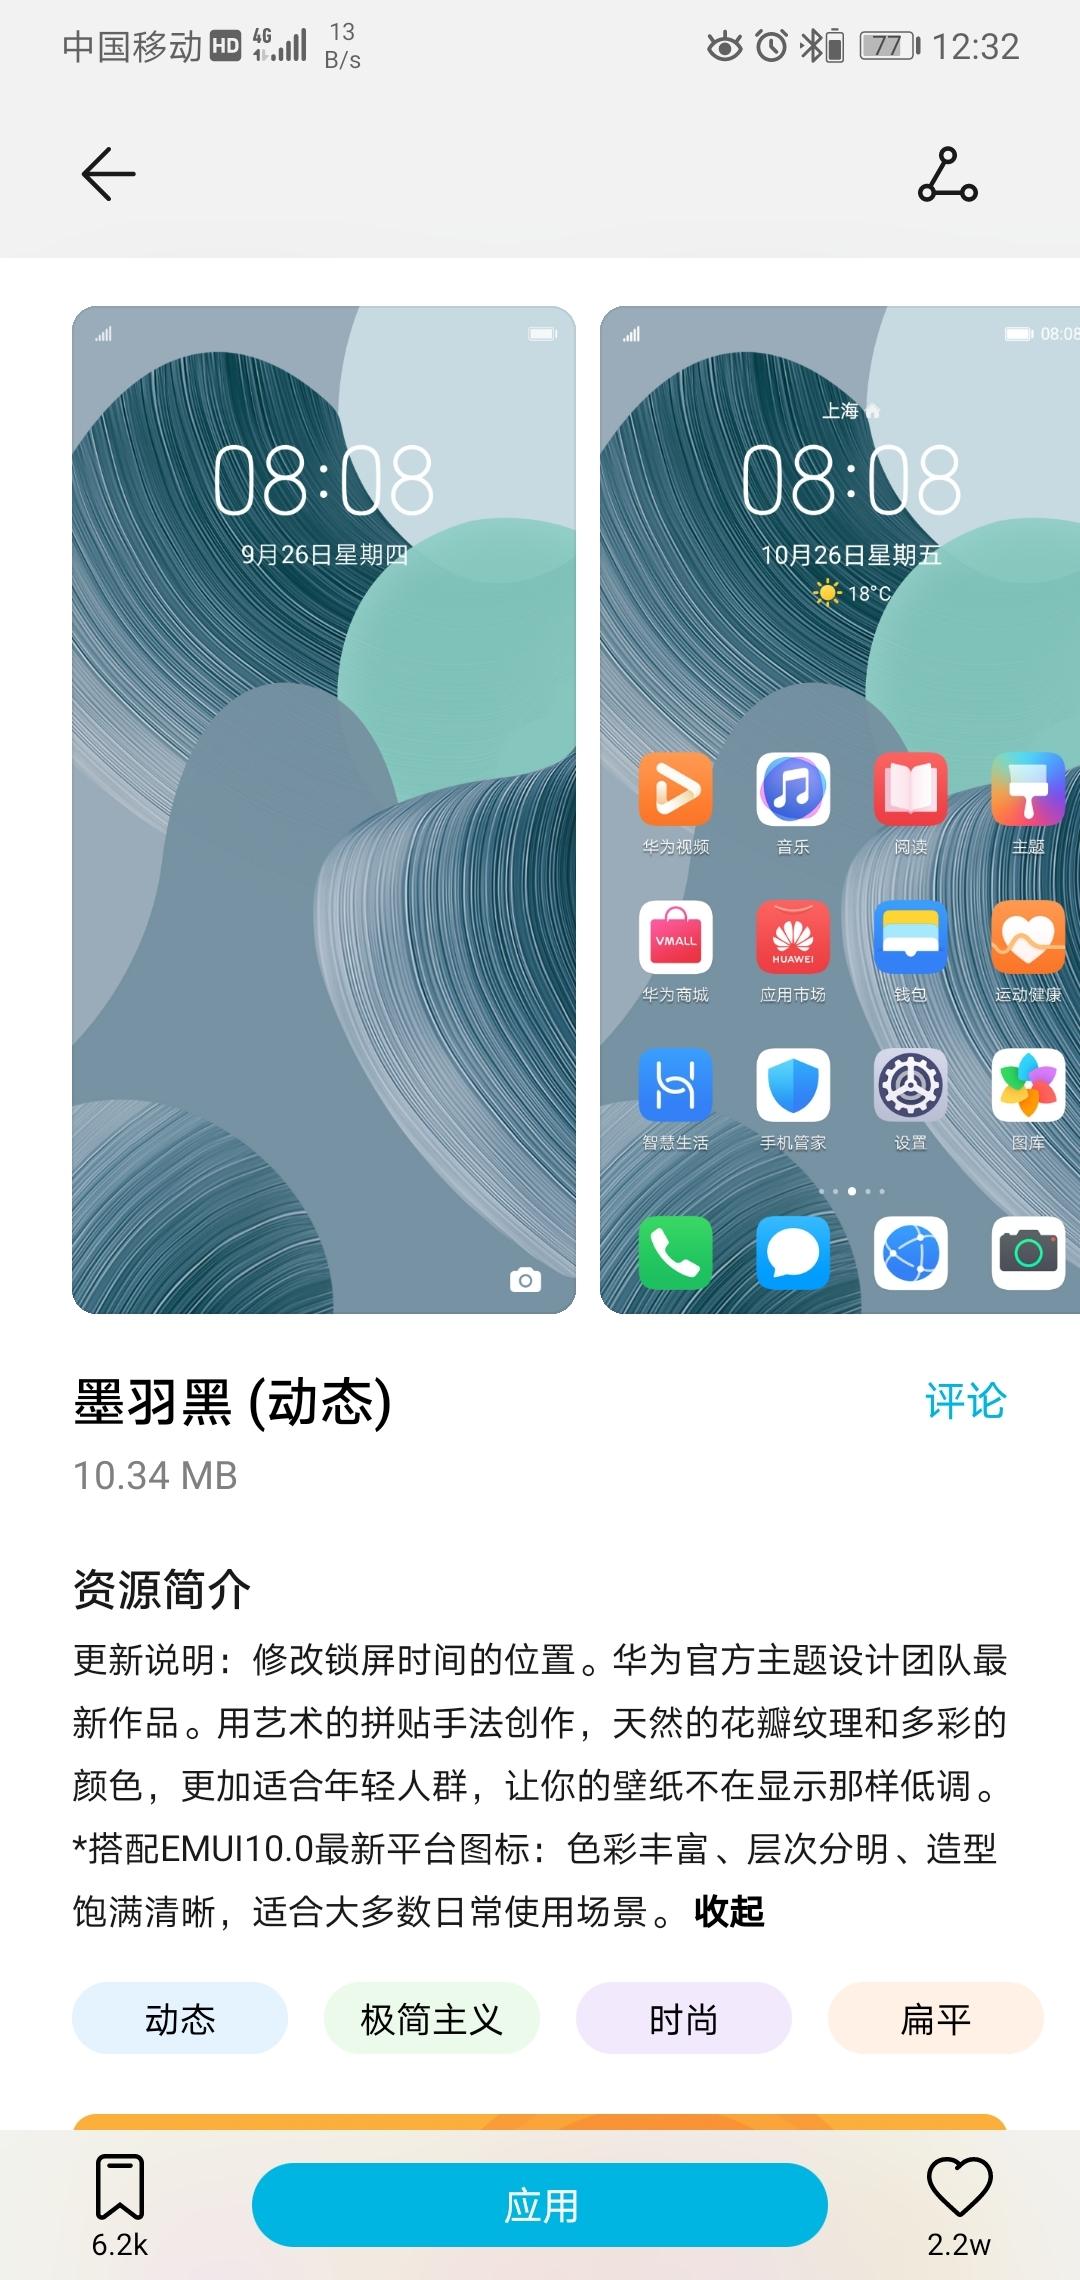 Screenshot_20200603_123233_com.huawei.android.thememanager.jpg